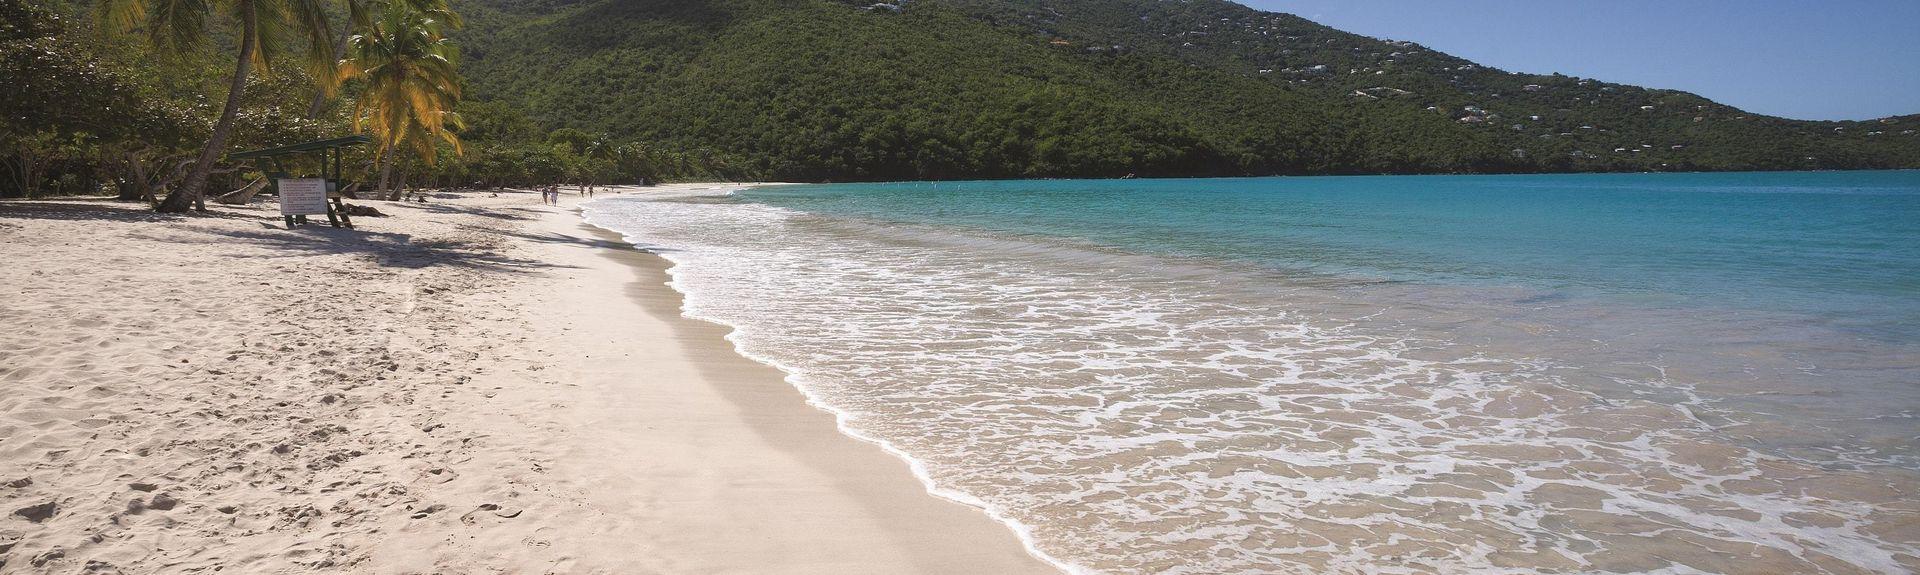 Elysian Beach Resort (Estate Nazareth, St. Thomas, Îles Vierges des États-Unis)